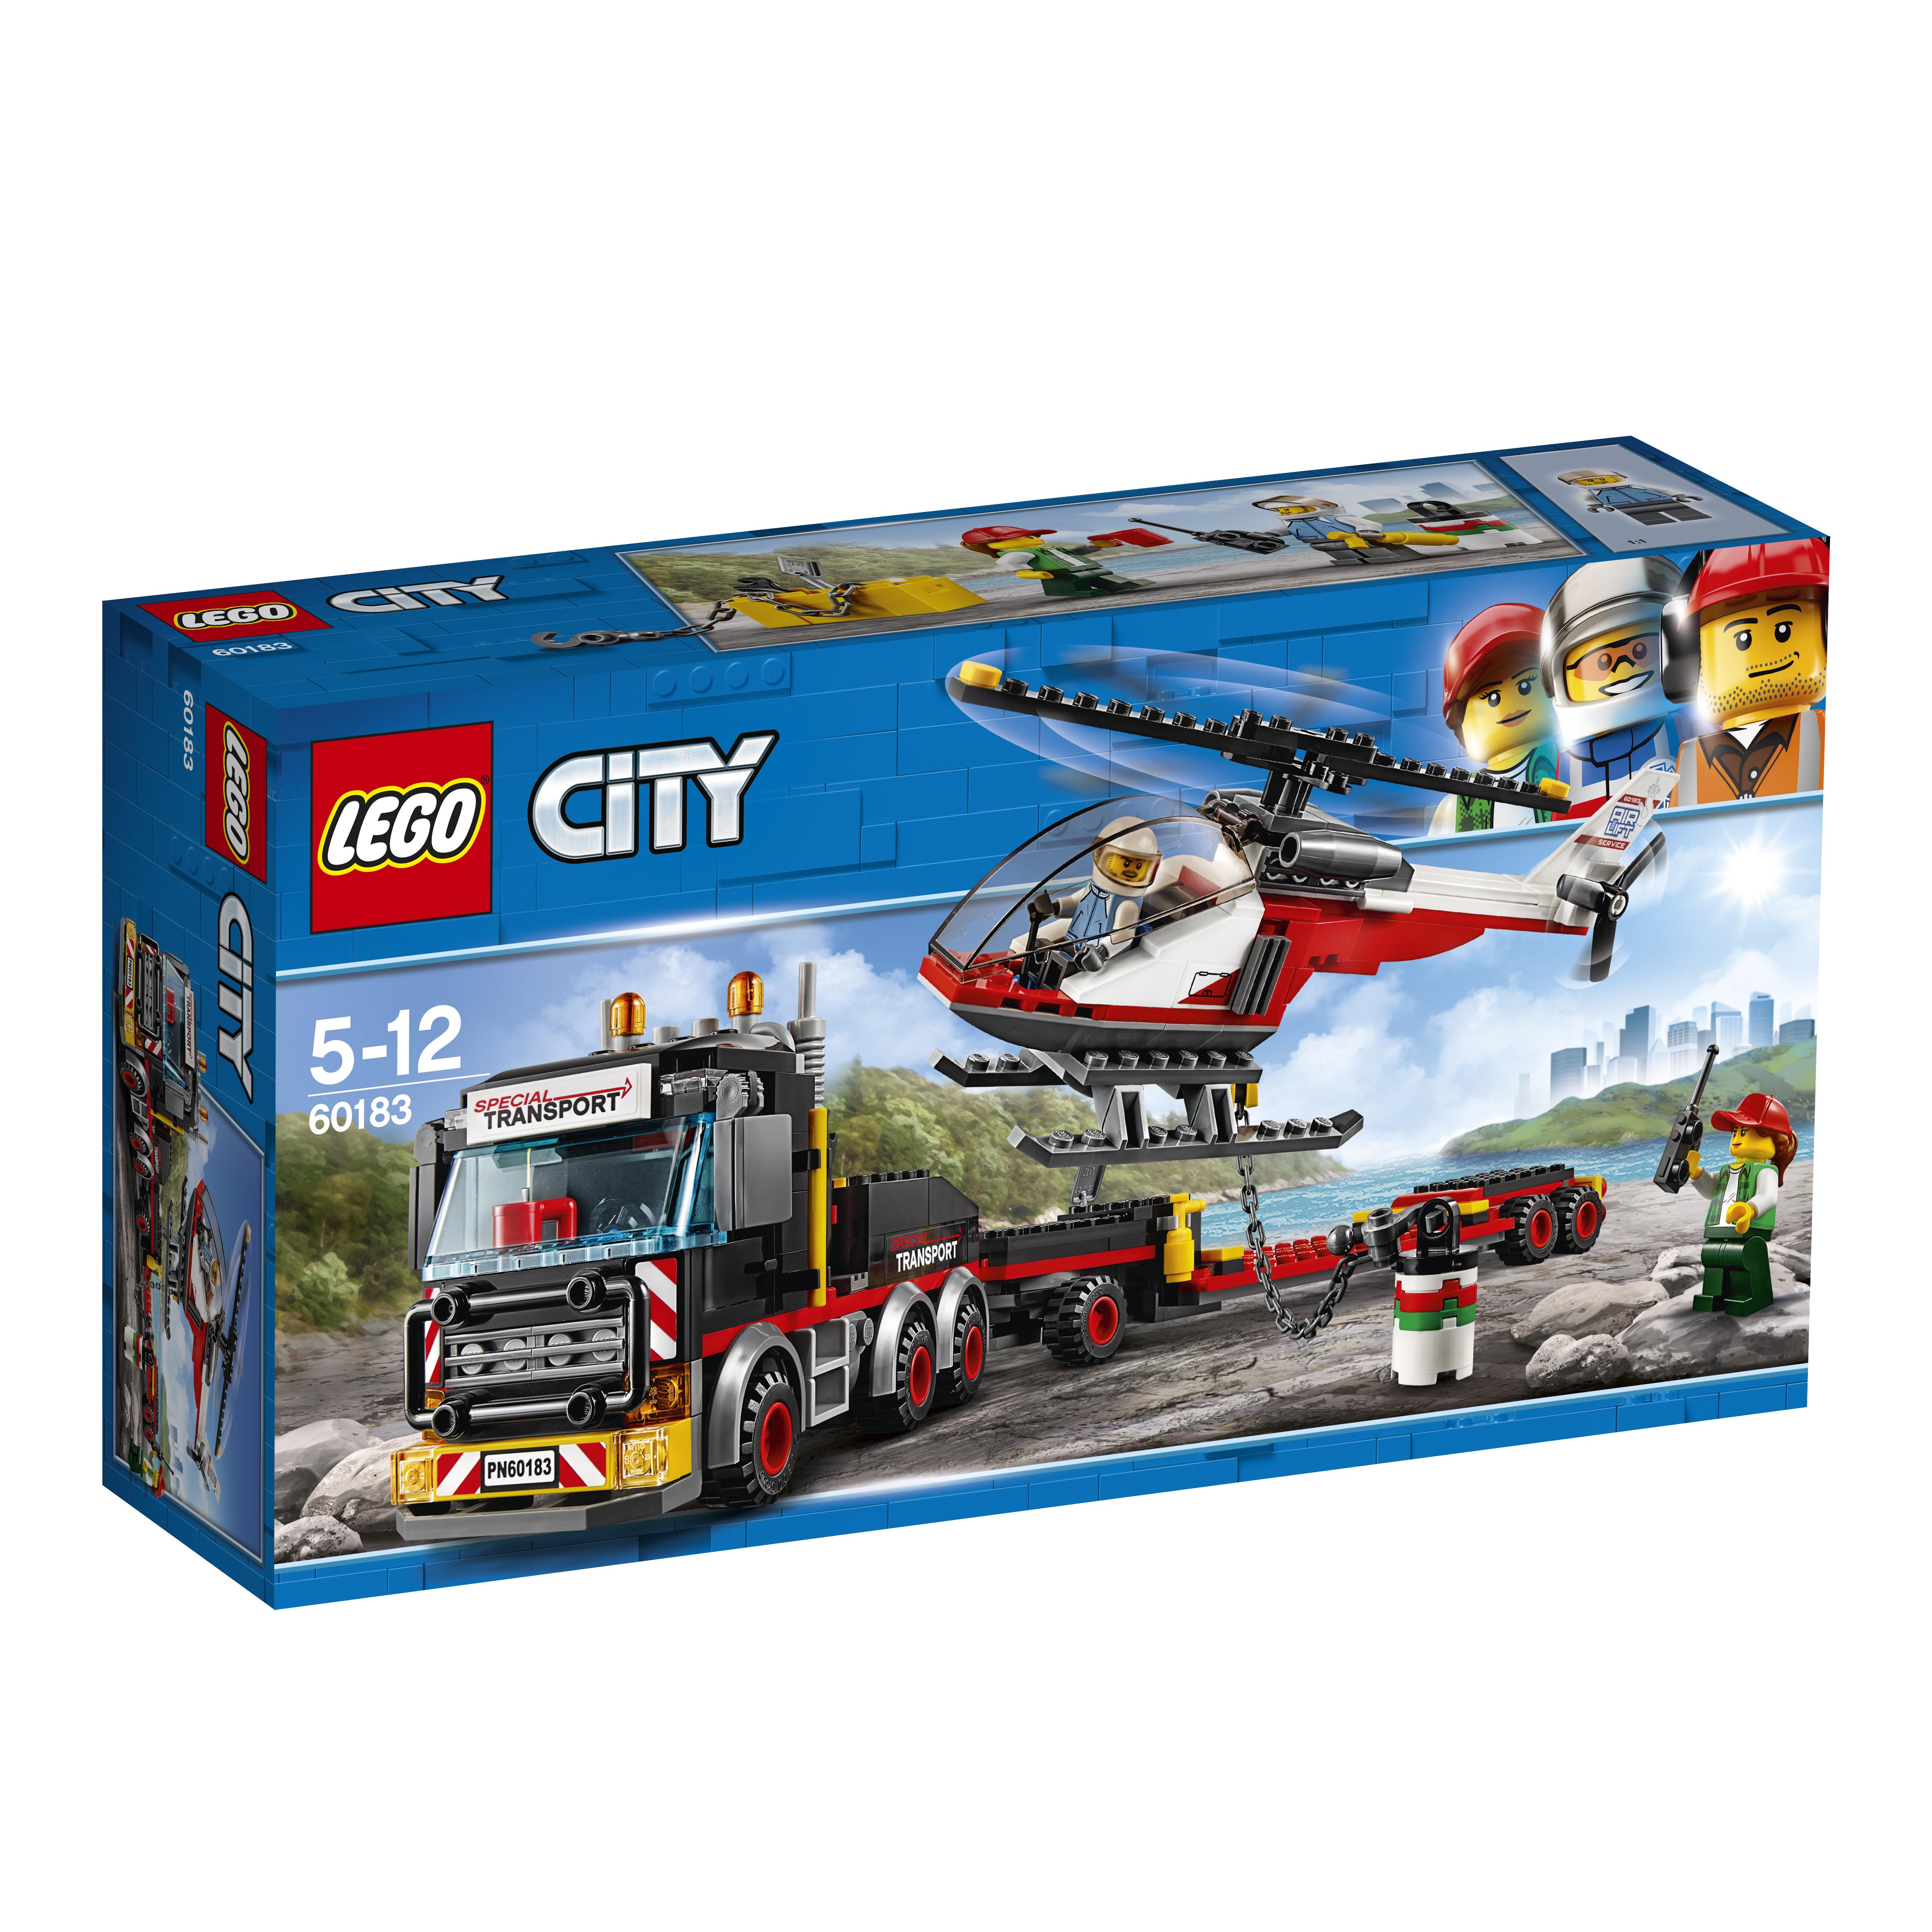 LEGO LEGO City Great Vehicles 60183 Перевозчик вертолета конструкторы lego lego city great vehicles рыболовный катер 60147